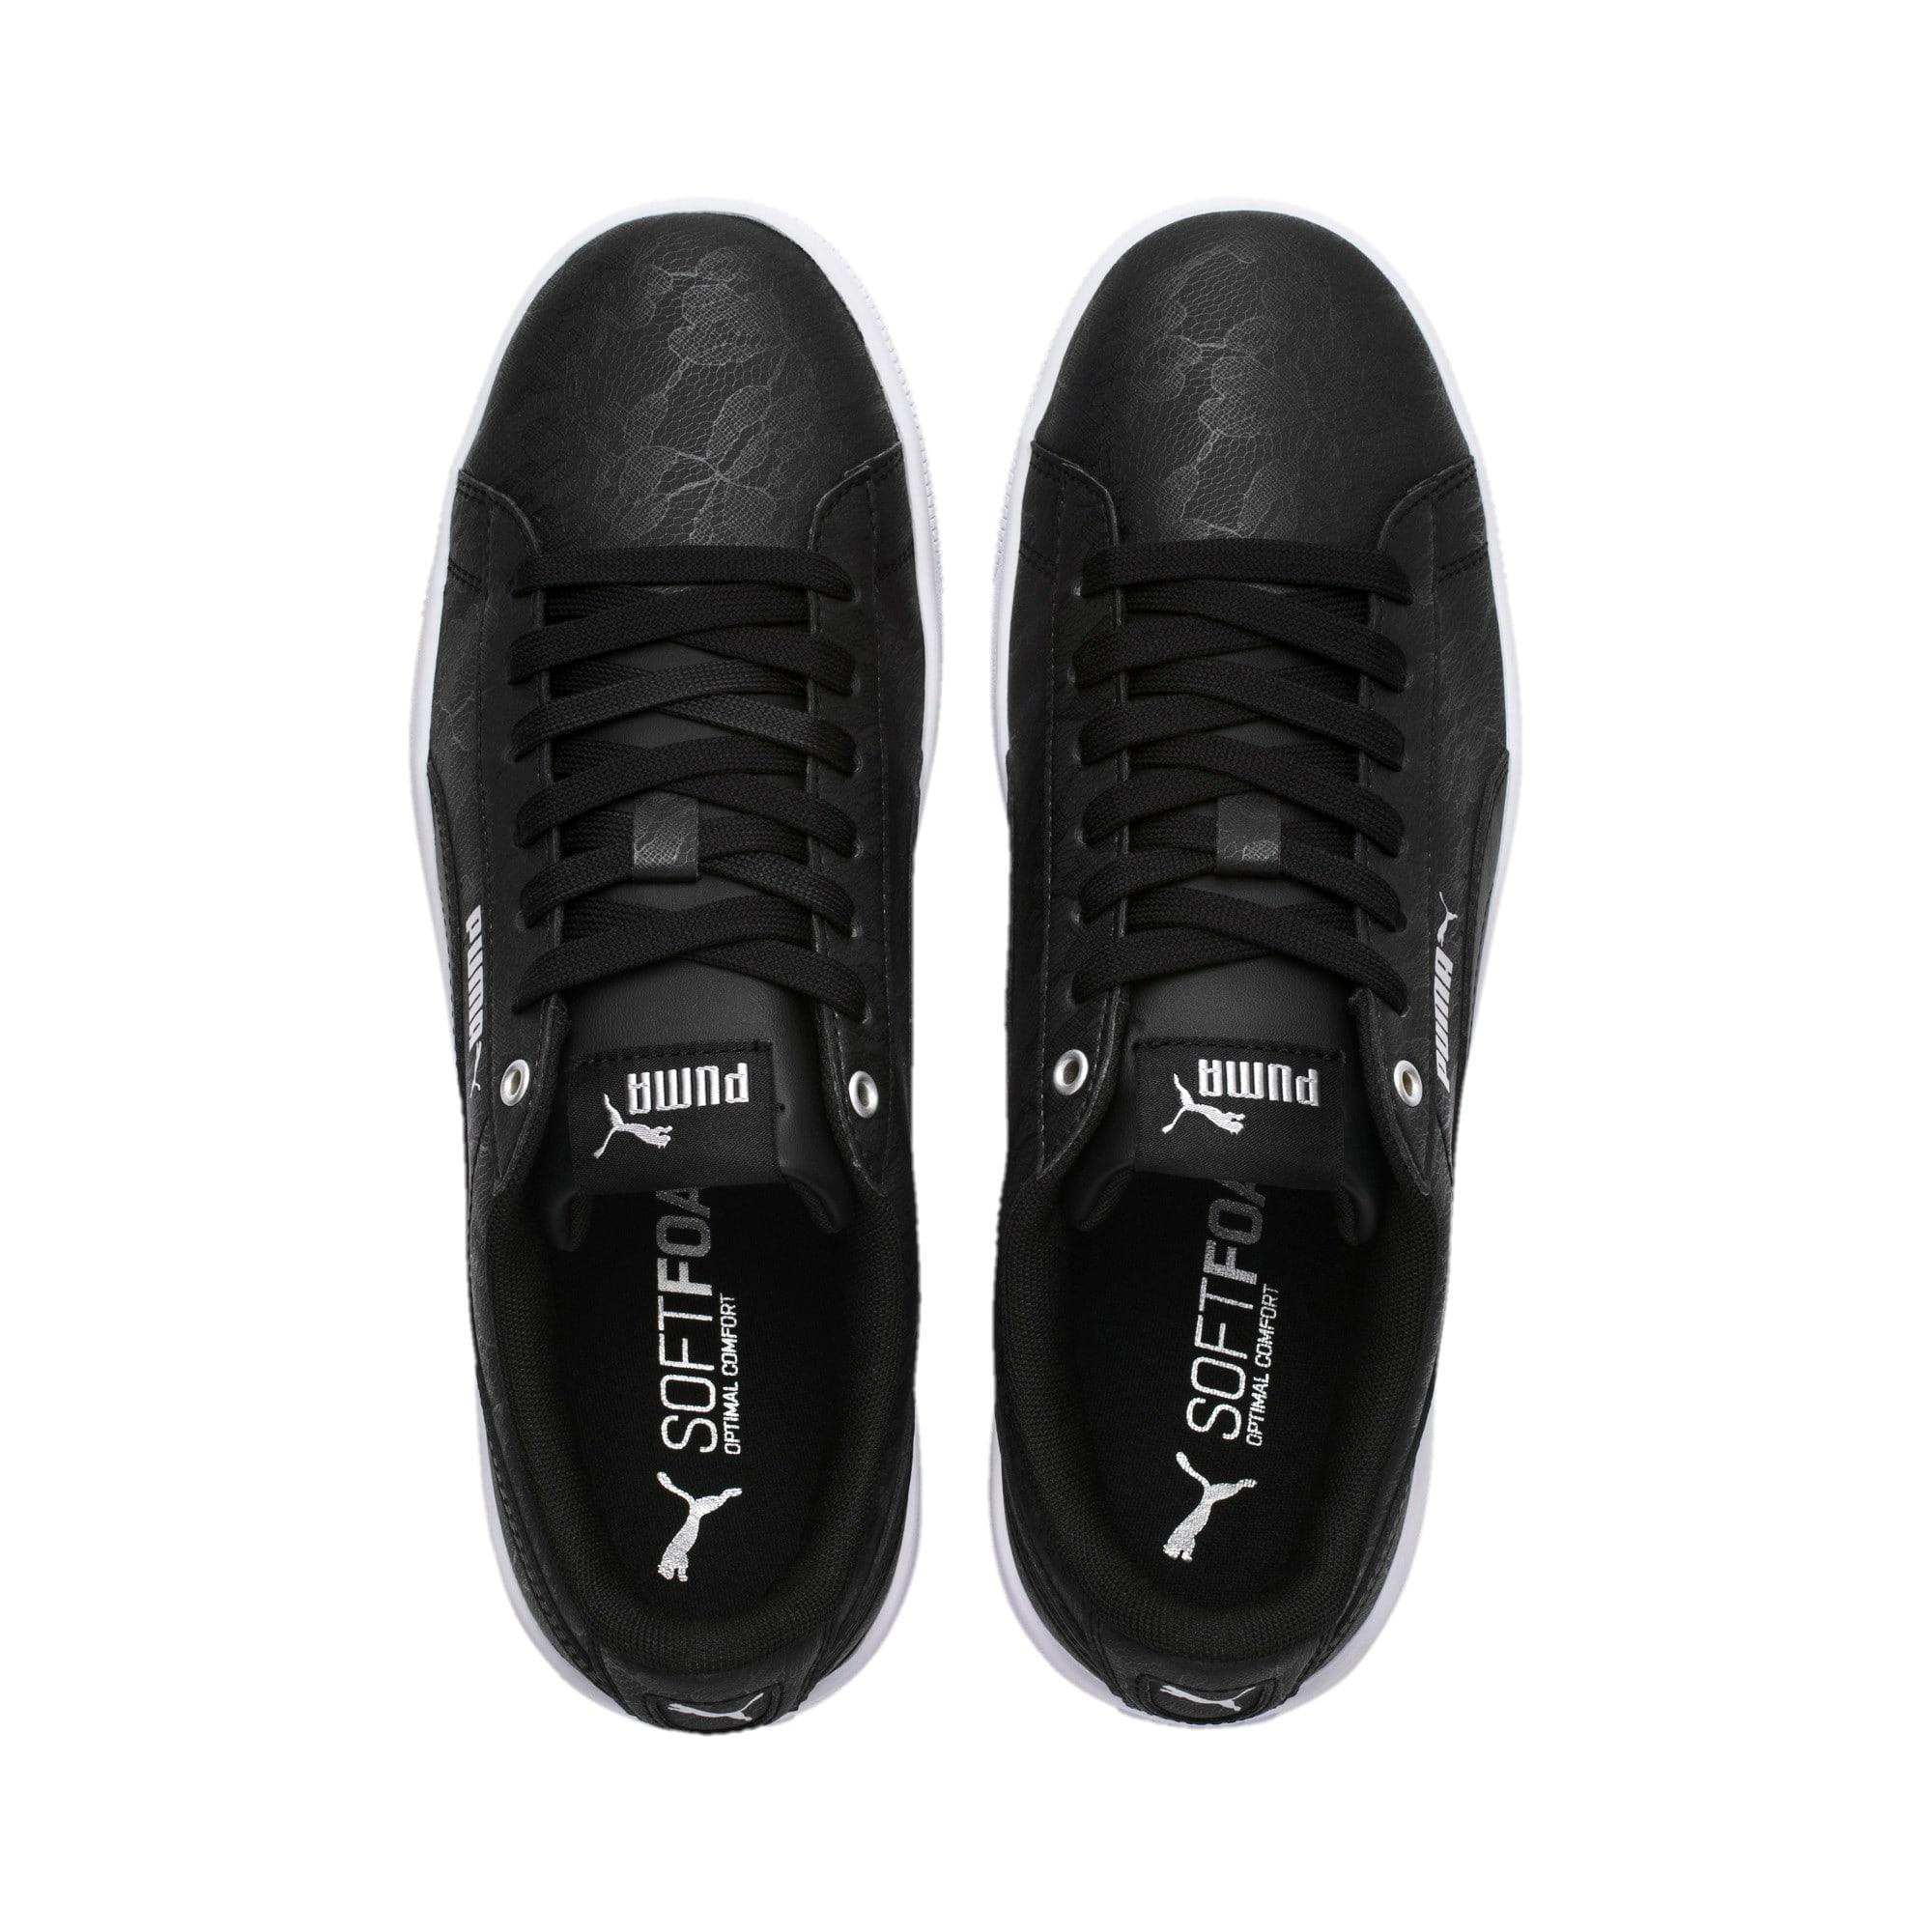 Thumbnail 6 of PUMA Vikky v2 Summer Women's Sneakers, Puma Black-Silver-Puma White, medium